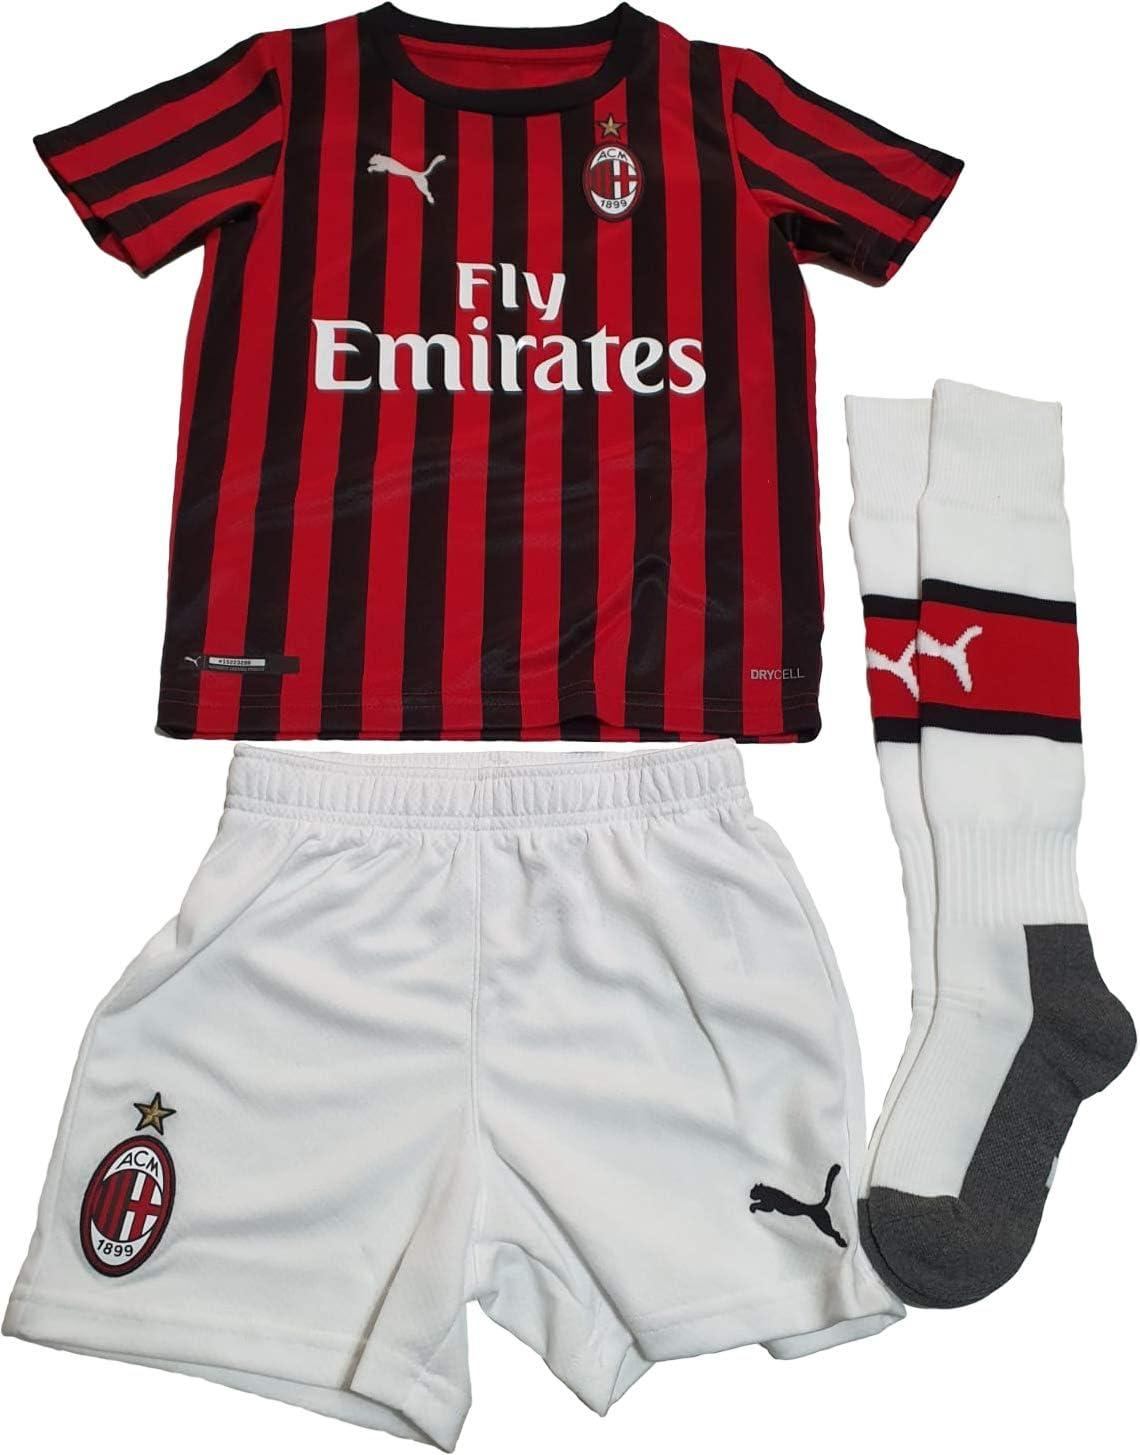 Amazon Com Magusa S R L S Ac Milan Home Replica 2019 2020 Ibrahimovic Child Baby Kit Football Boys Kitbaby01 Tango Red Black 74 Sports Outdoors